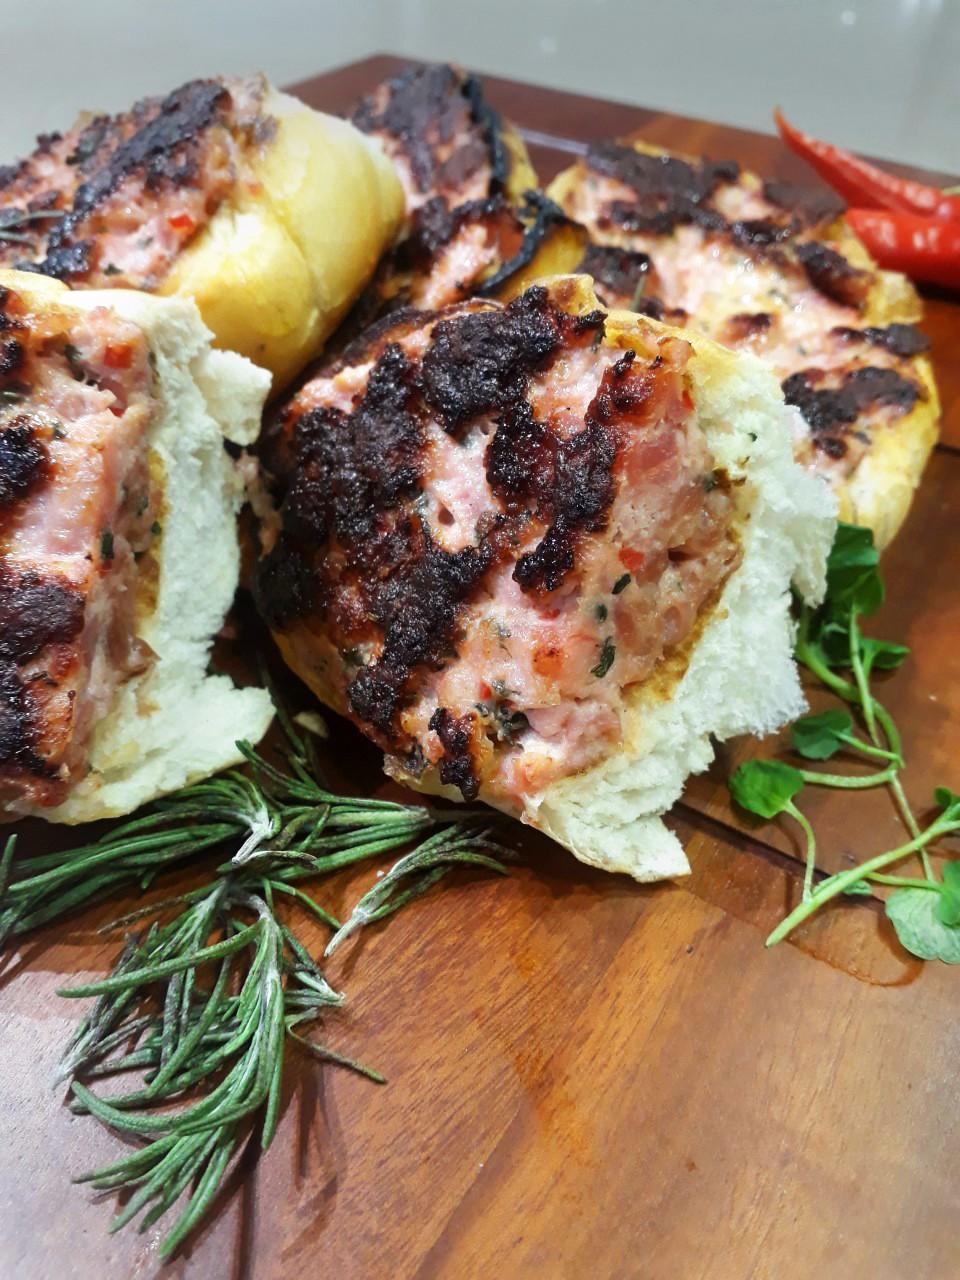 Pãoliça - Pão com Linguiça Santa Clara